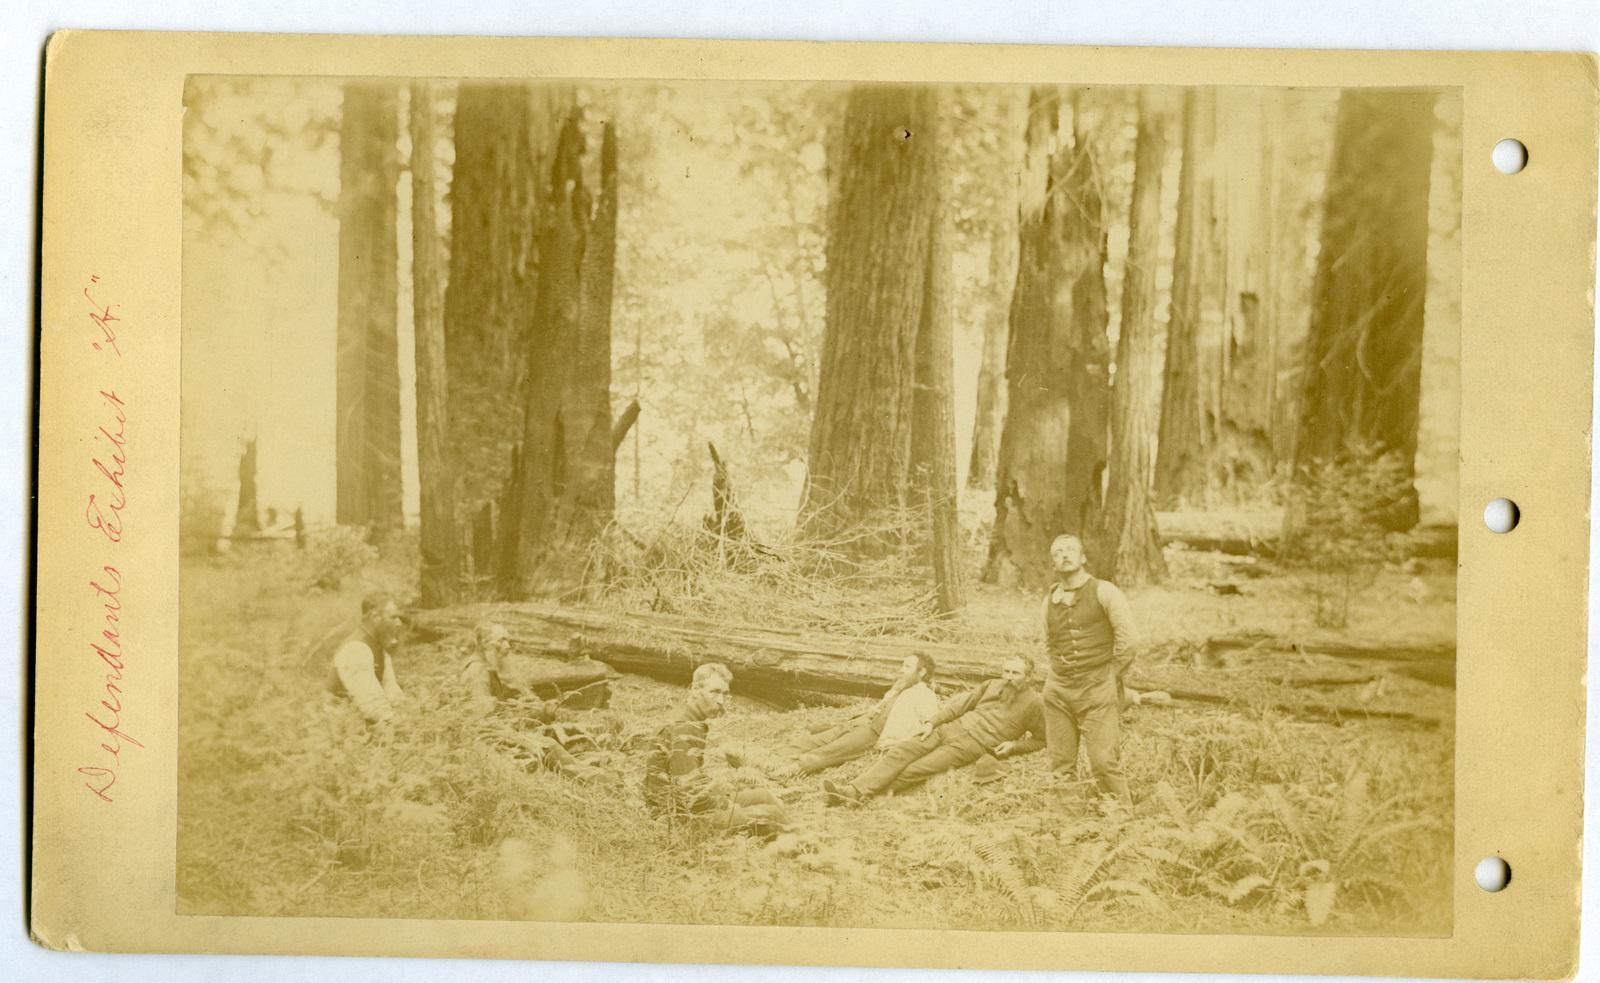 Photograph of Six Men Resting Near Fallen Trees